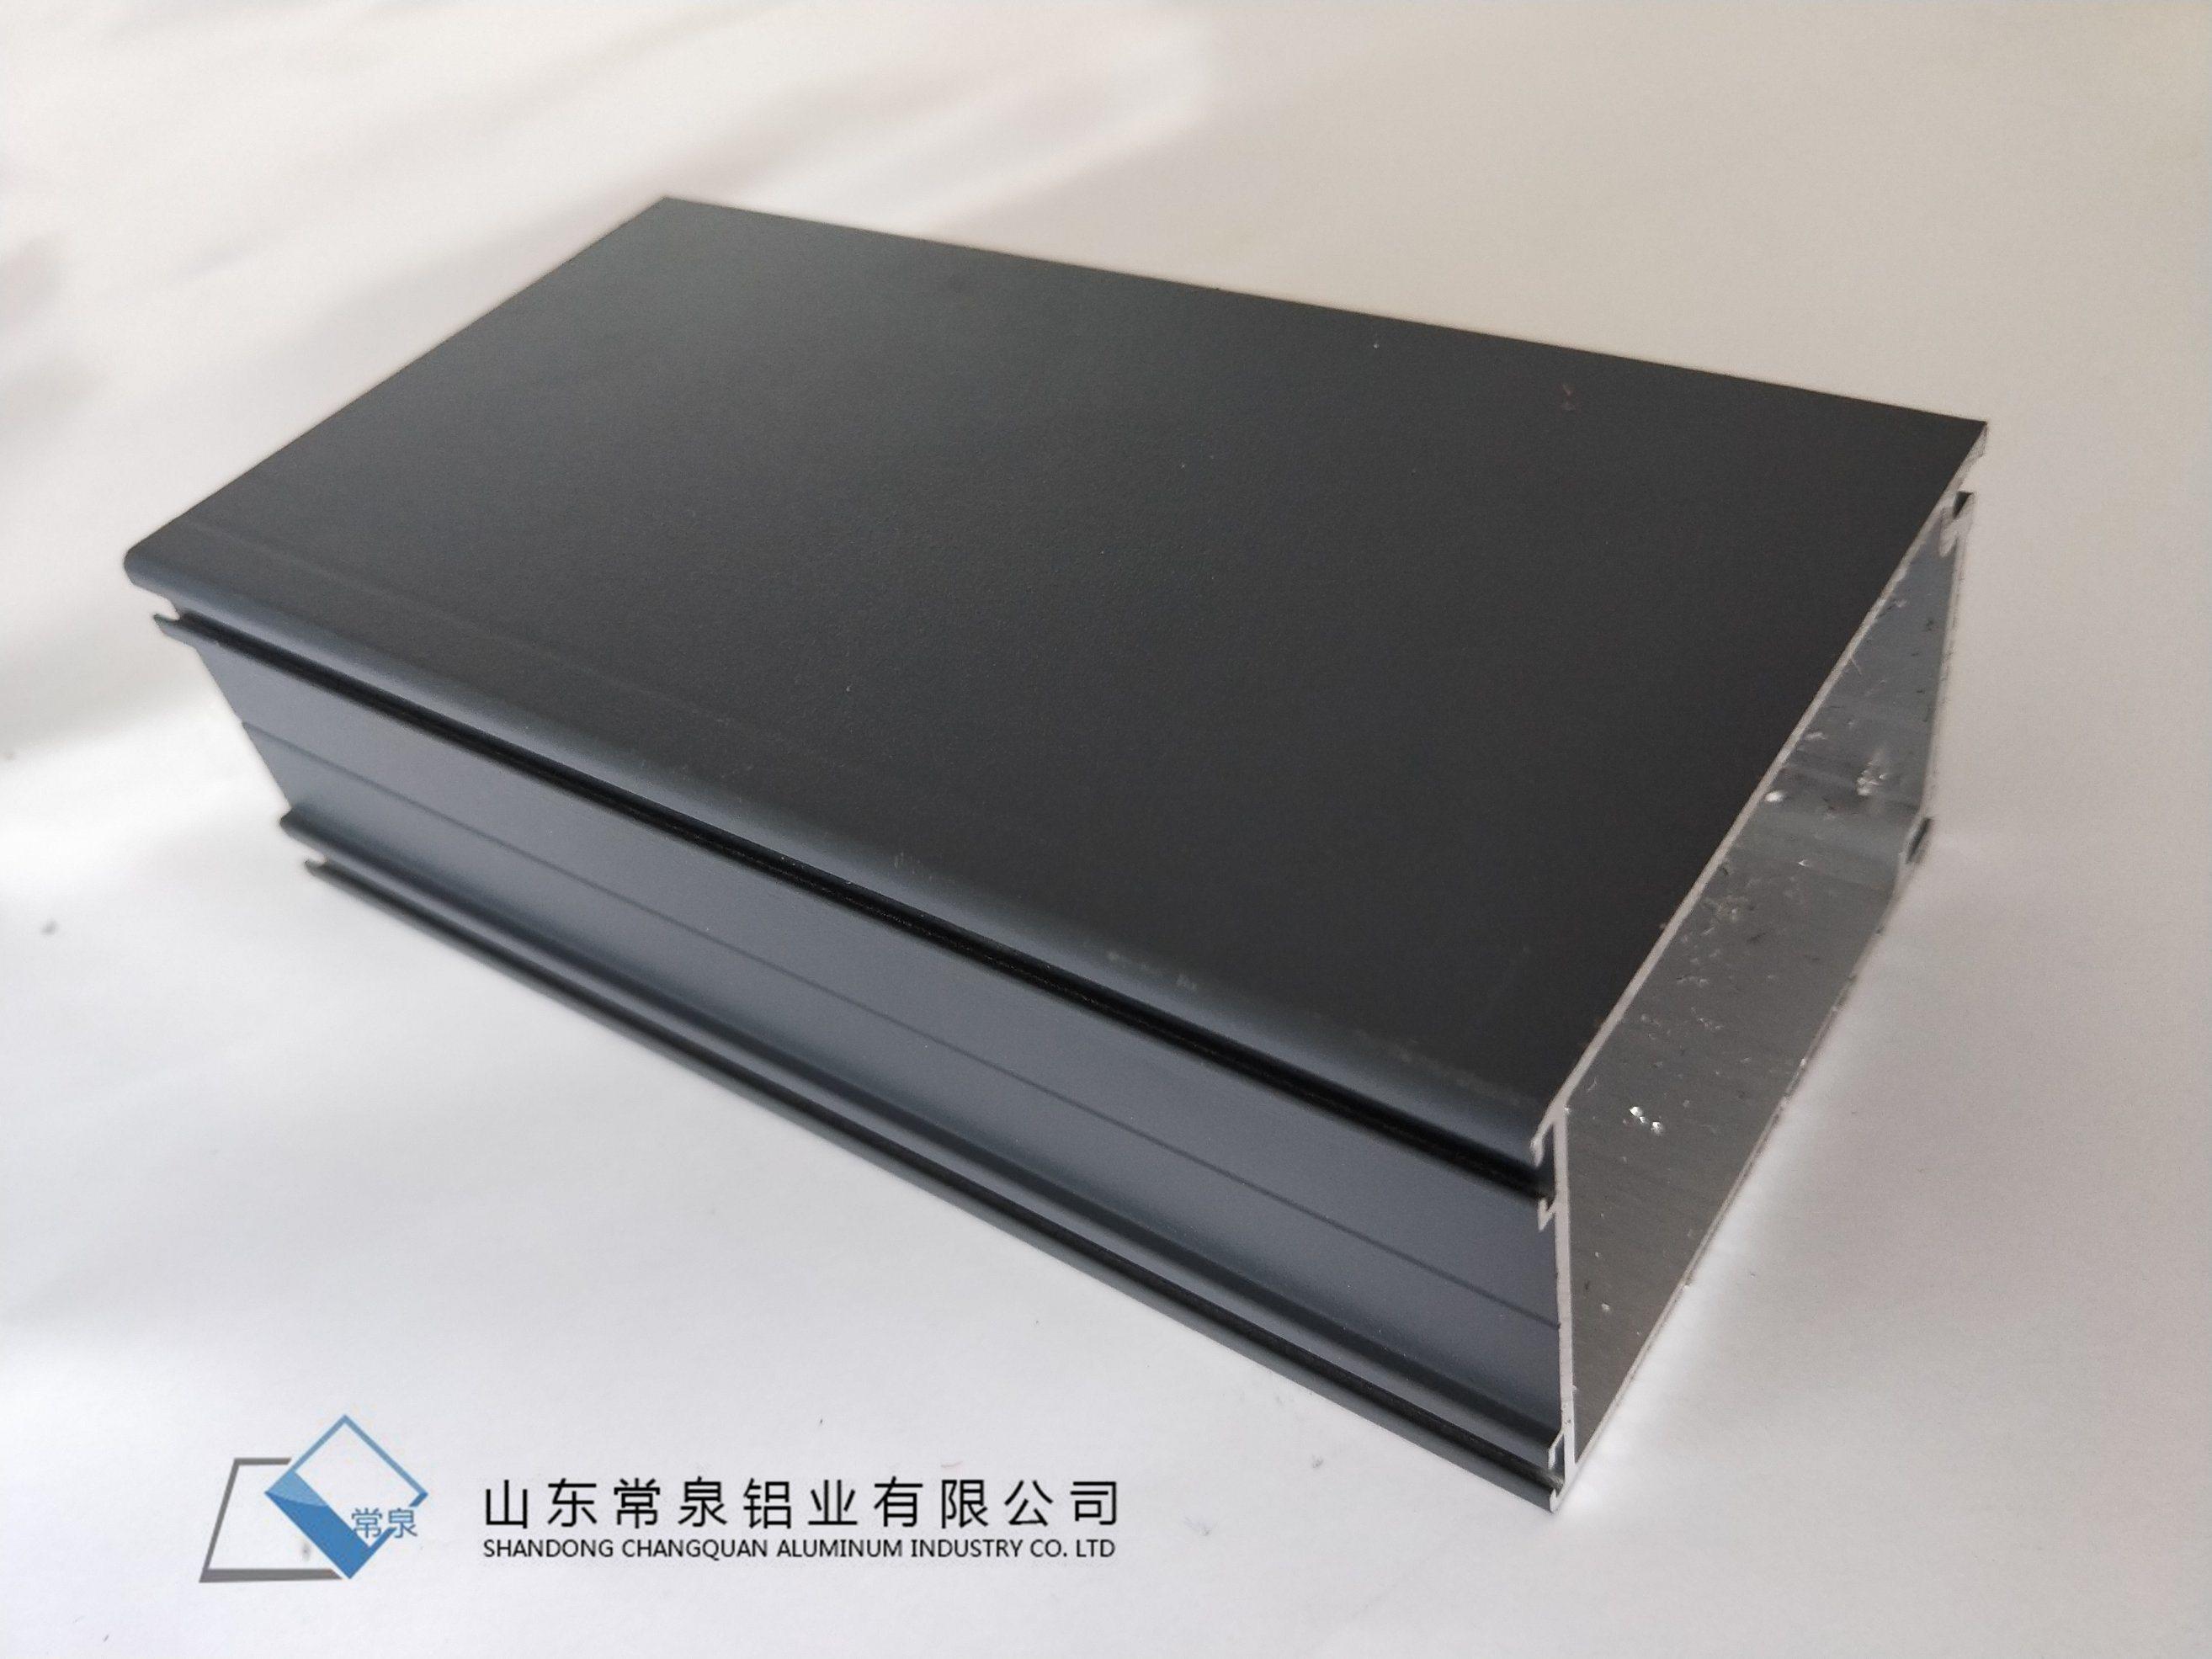 Wholesale Aluminum Profile Frame - Buy Reliable Aluminum Profile ...